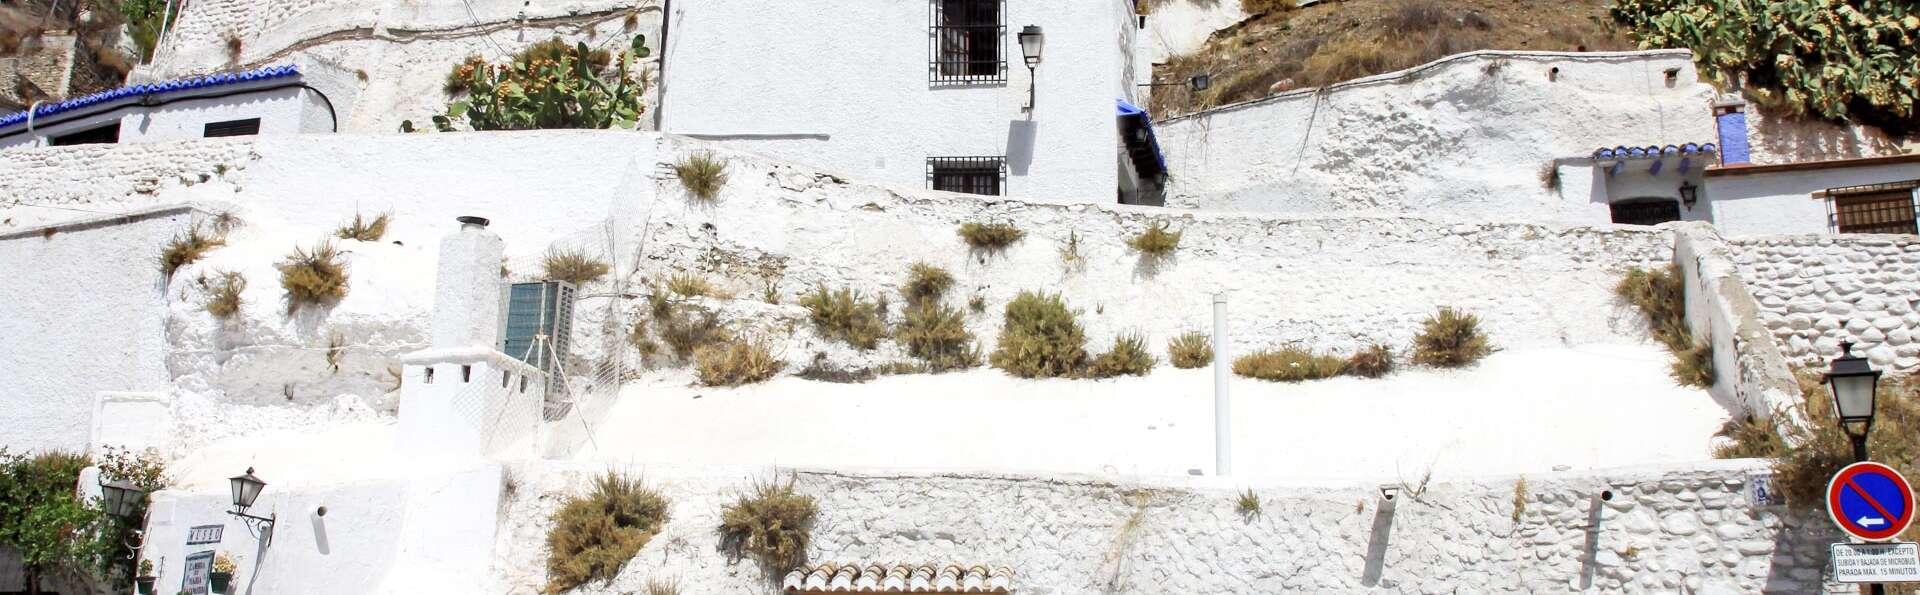 Hotel La Fragua I - EDIT_DESTINATION_02.jpg